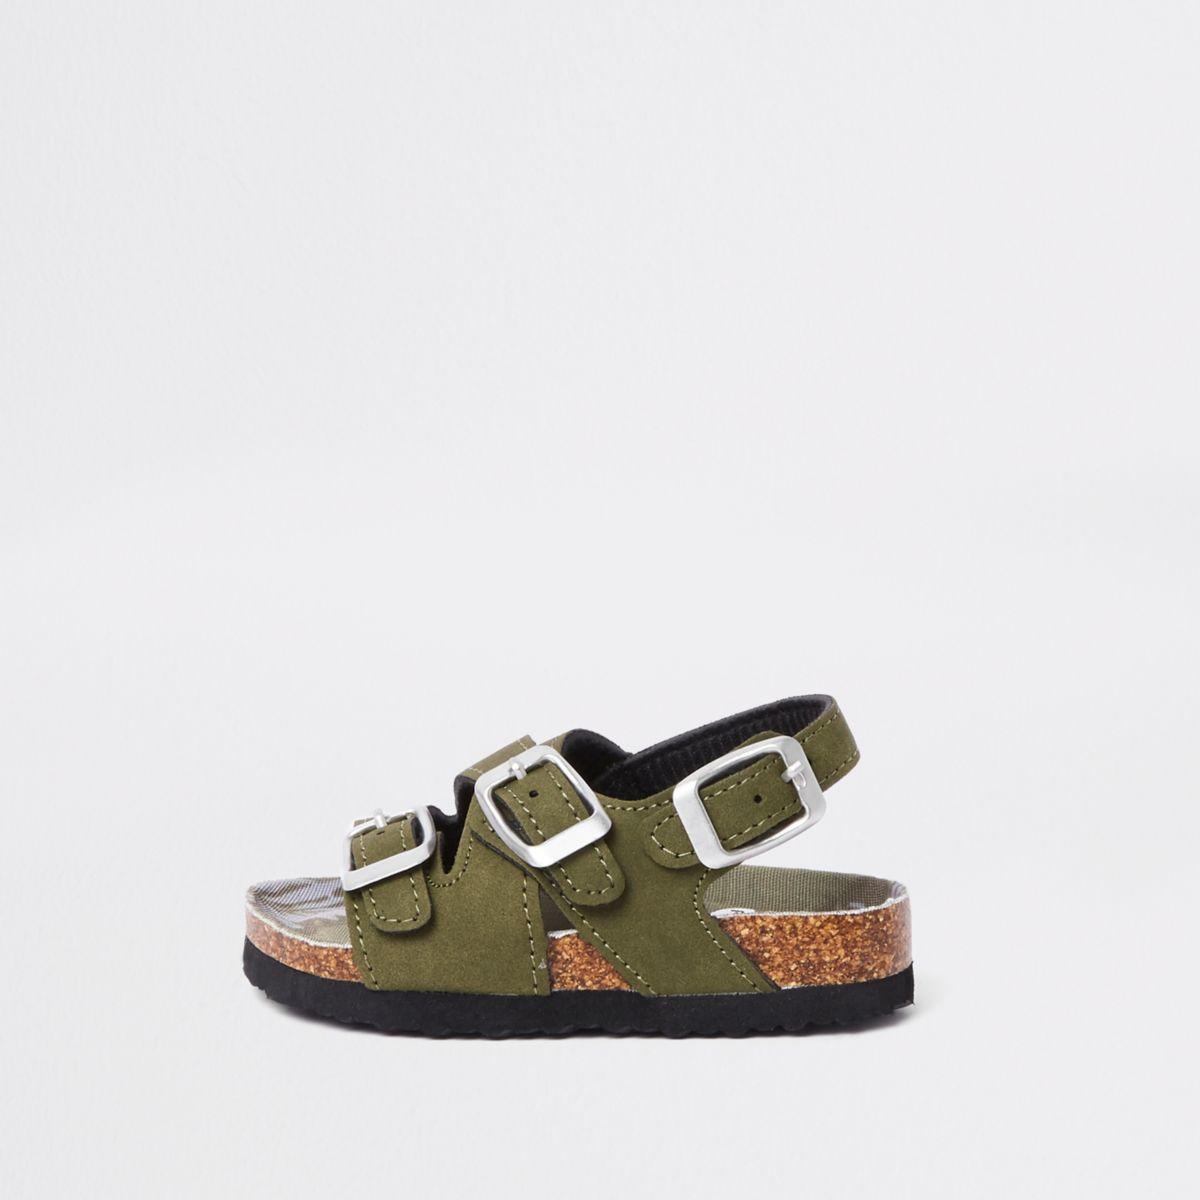 Sandales kaki à boucles avec semelle en liège mini garçon